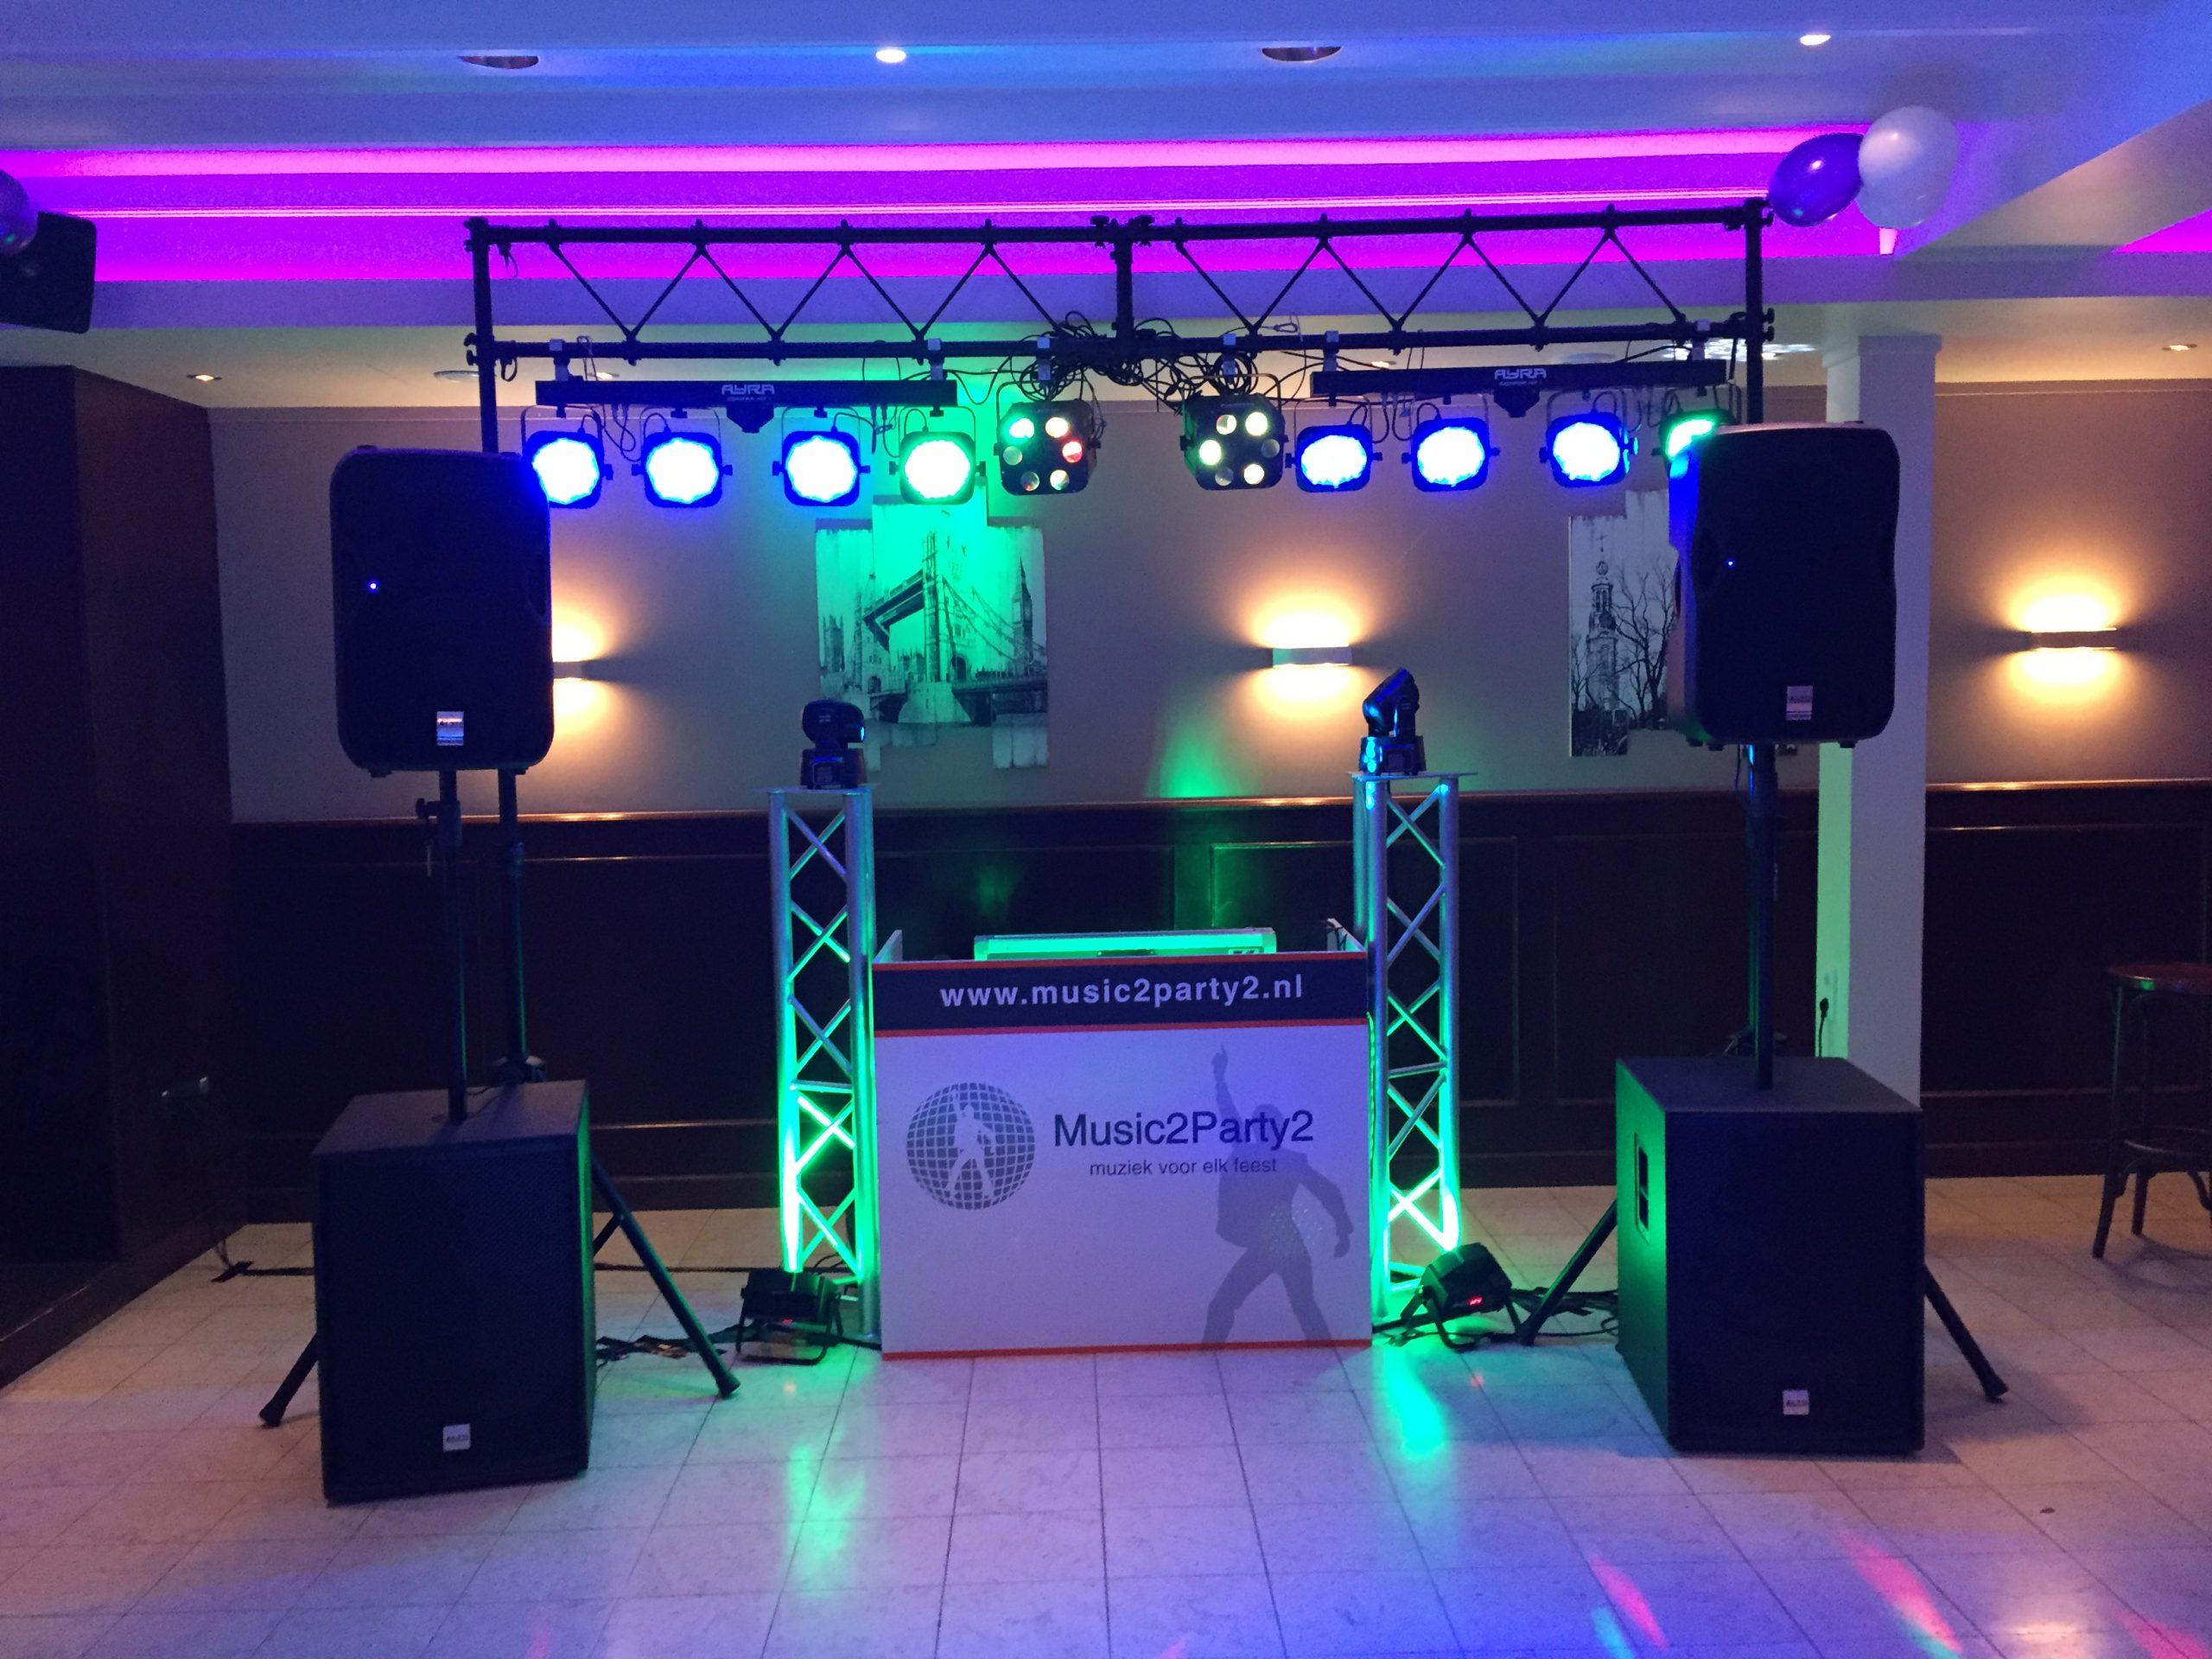 Music2Party2 Opstelling 25 jarig bruiloftfeest in Dorst